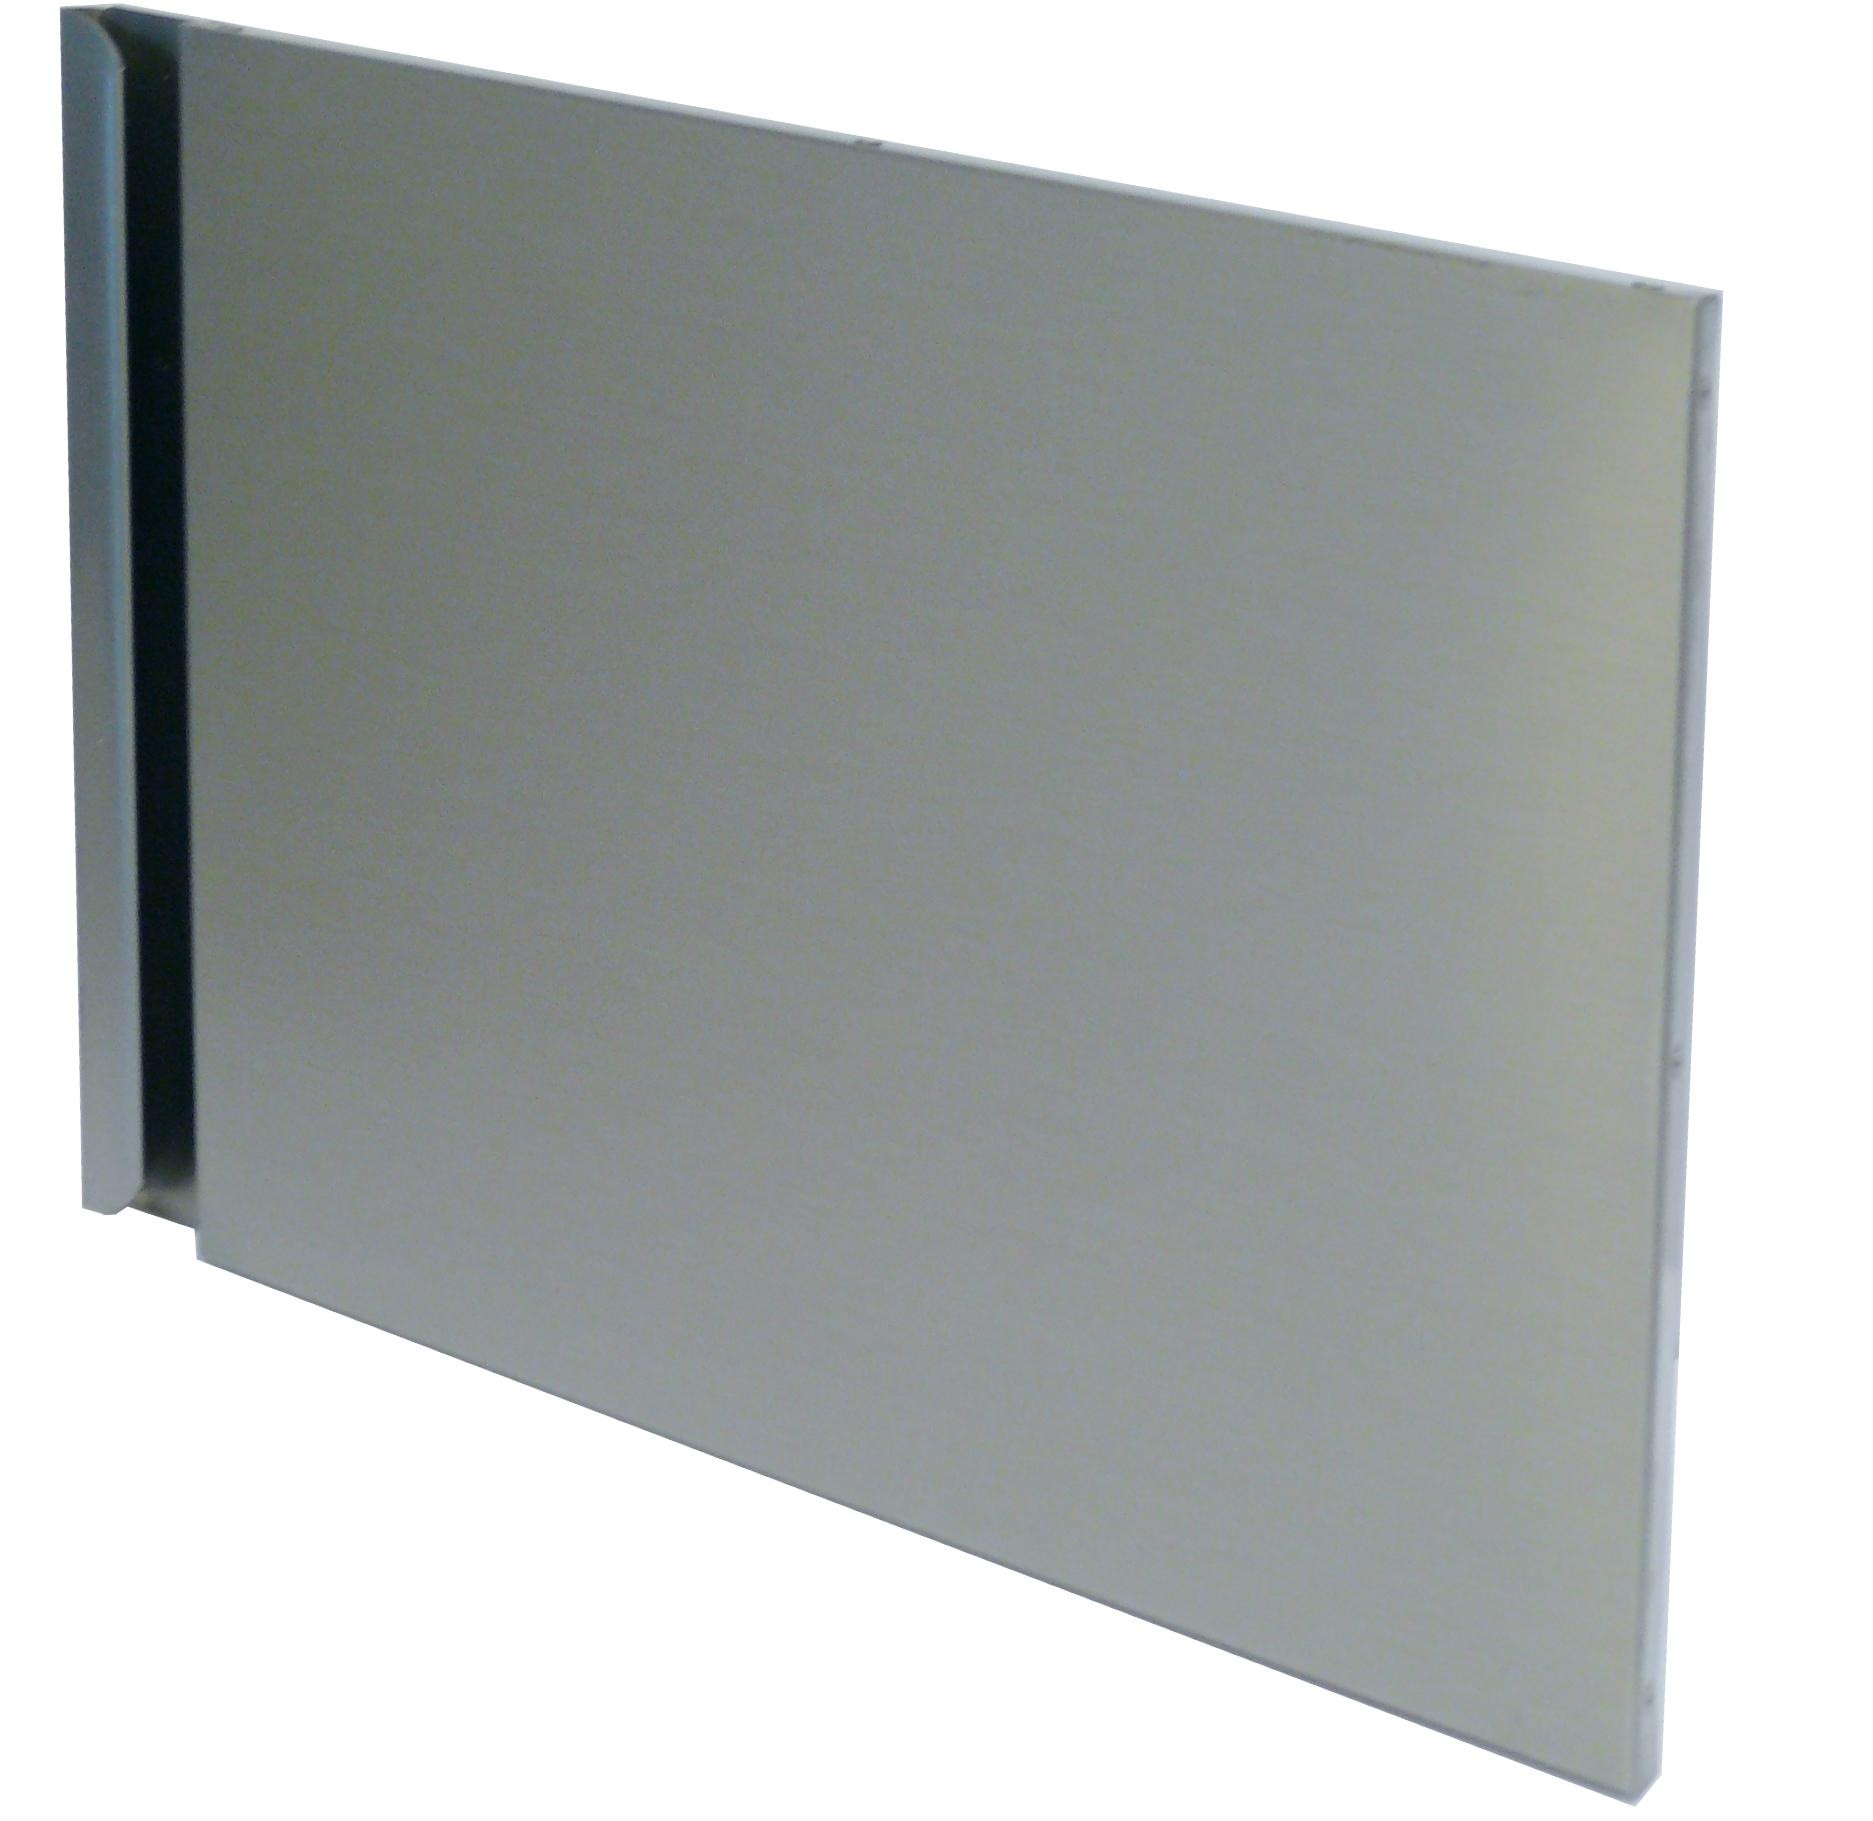 Eurodib USA AC00005 commercial dishwashers & glasswashers - accessories